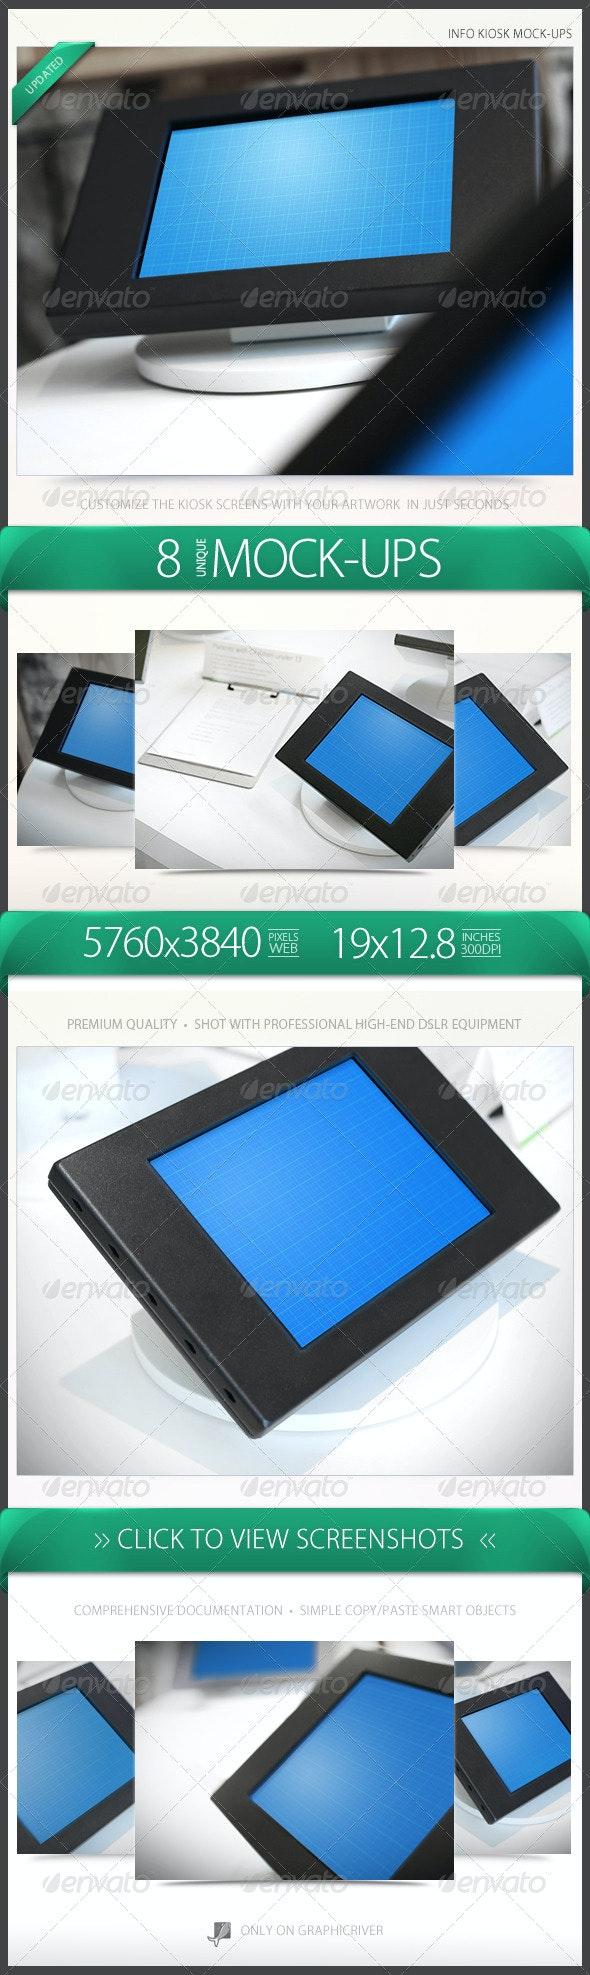 Info Kiosk Mock-Ups - Mobile Displays